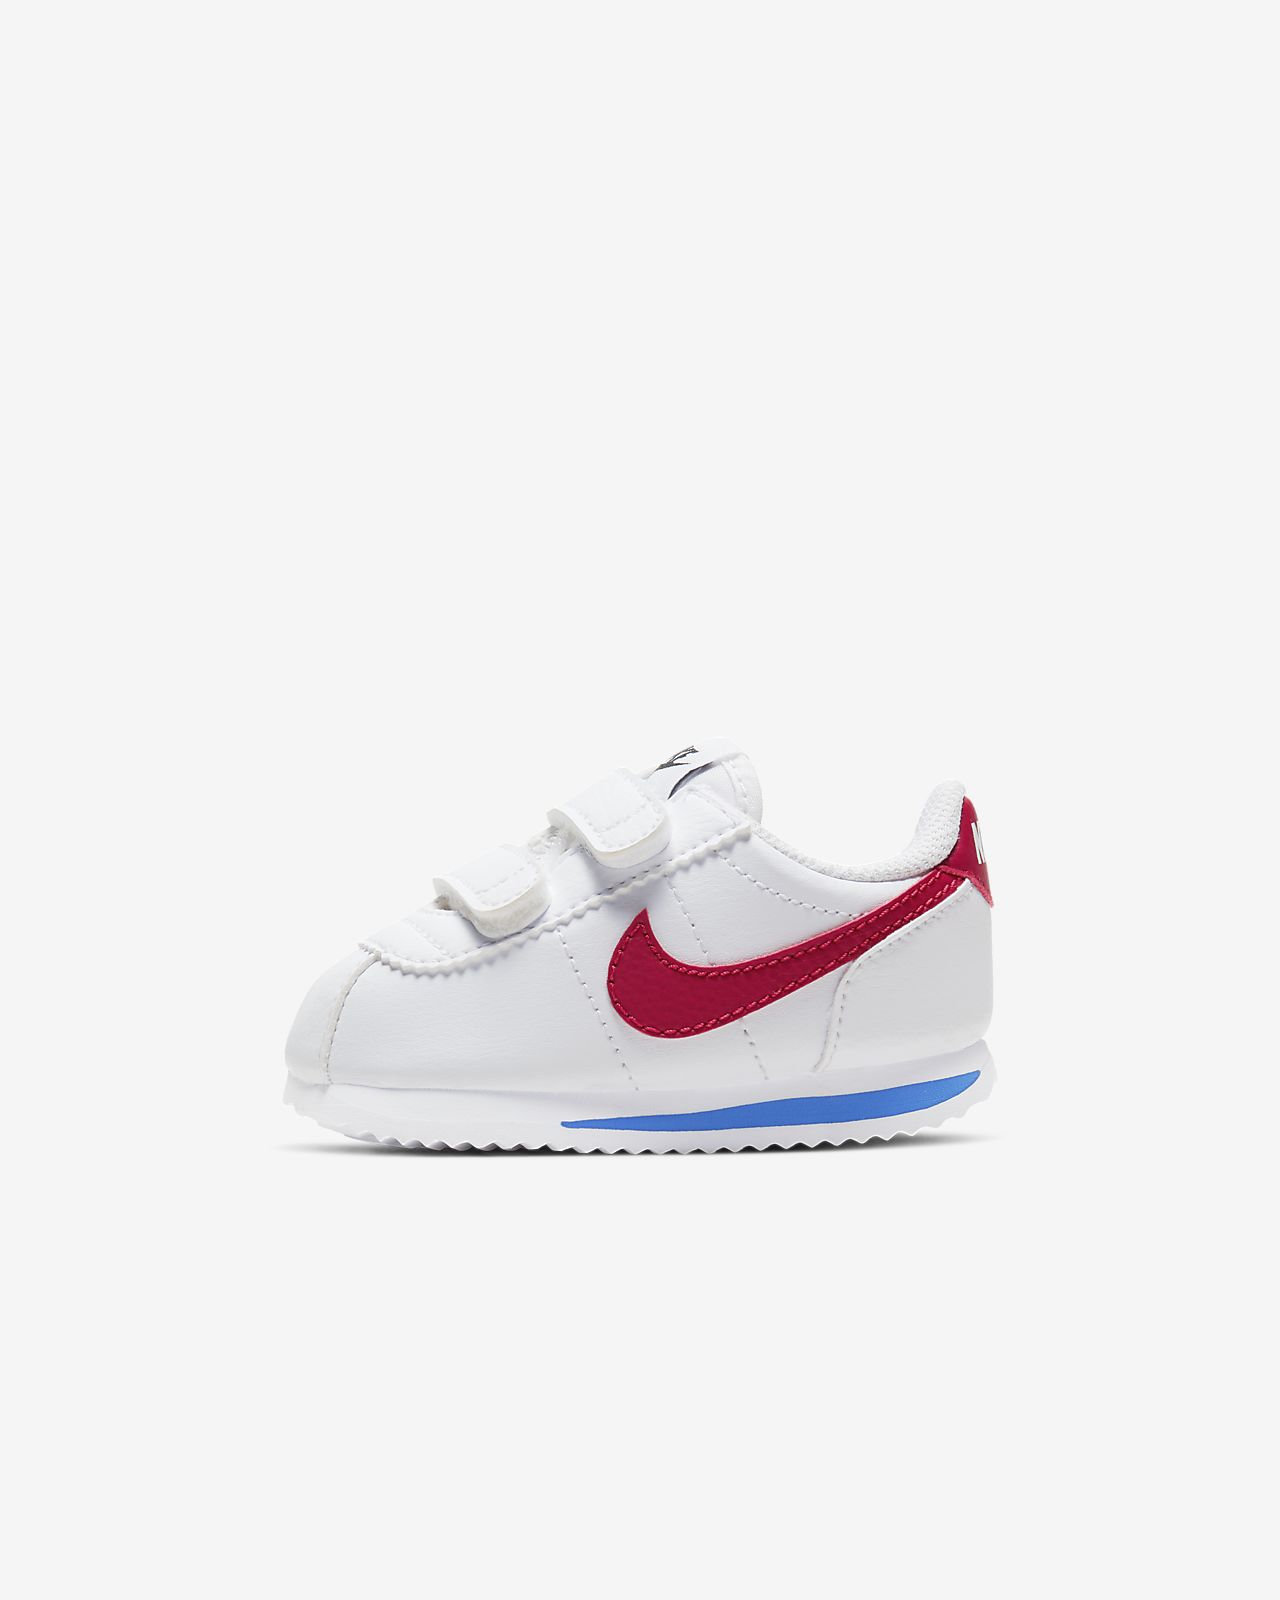 Nike Cortez Basic SL (TDV) 婴童运动童鞋